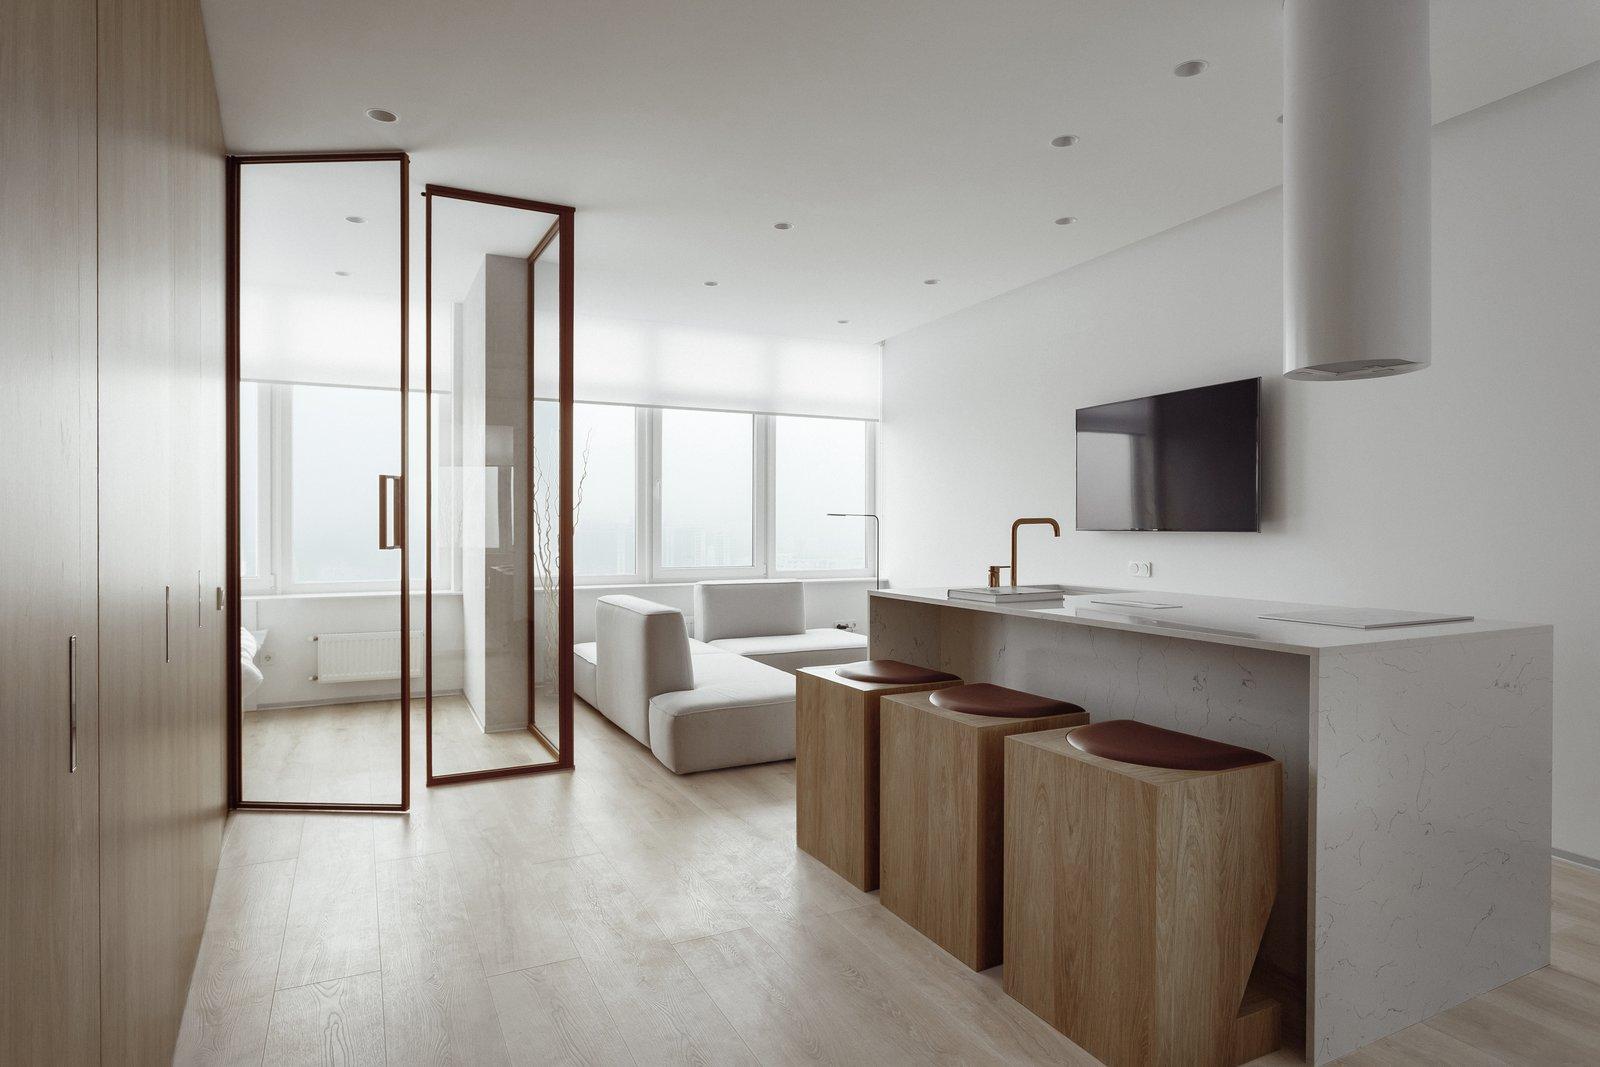 Living Room, Sofa, Ceiling Lighting, and Light Hardwood Floor  191 Apt.